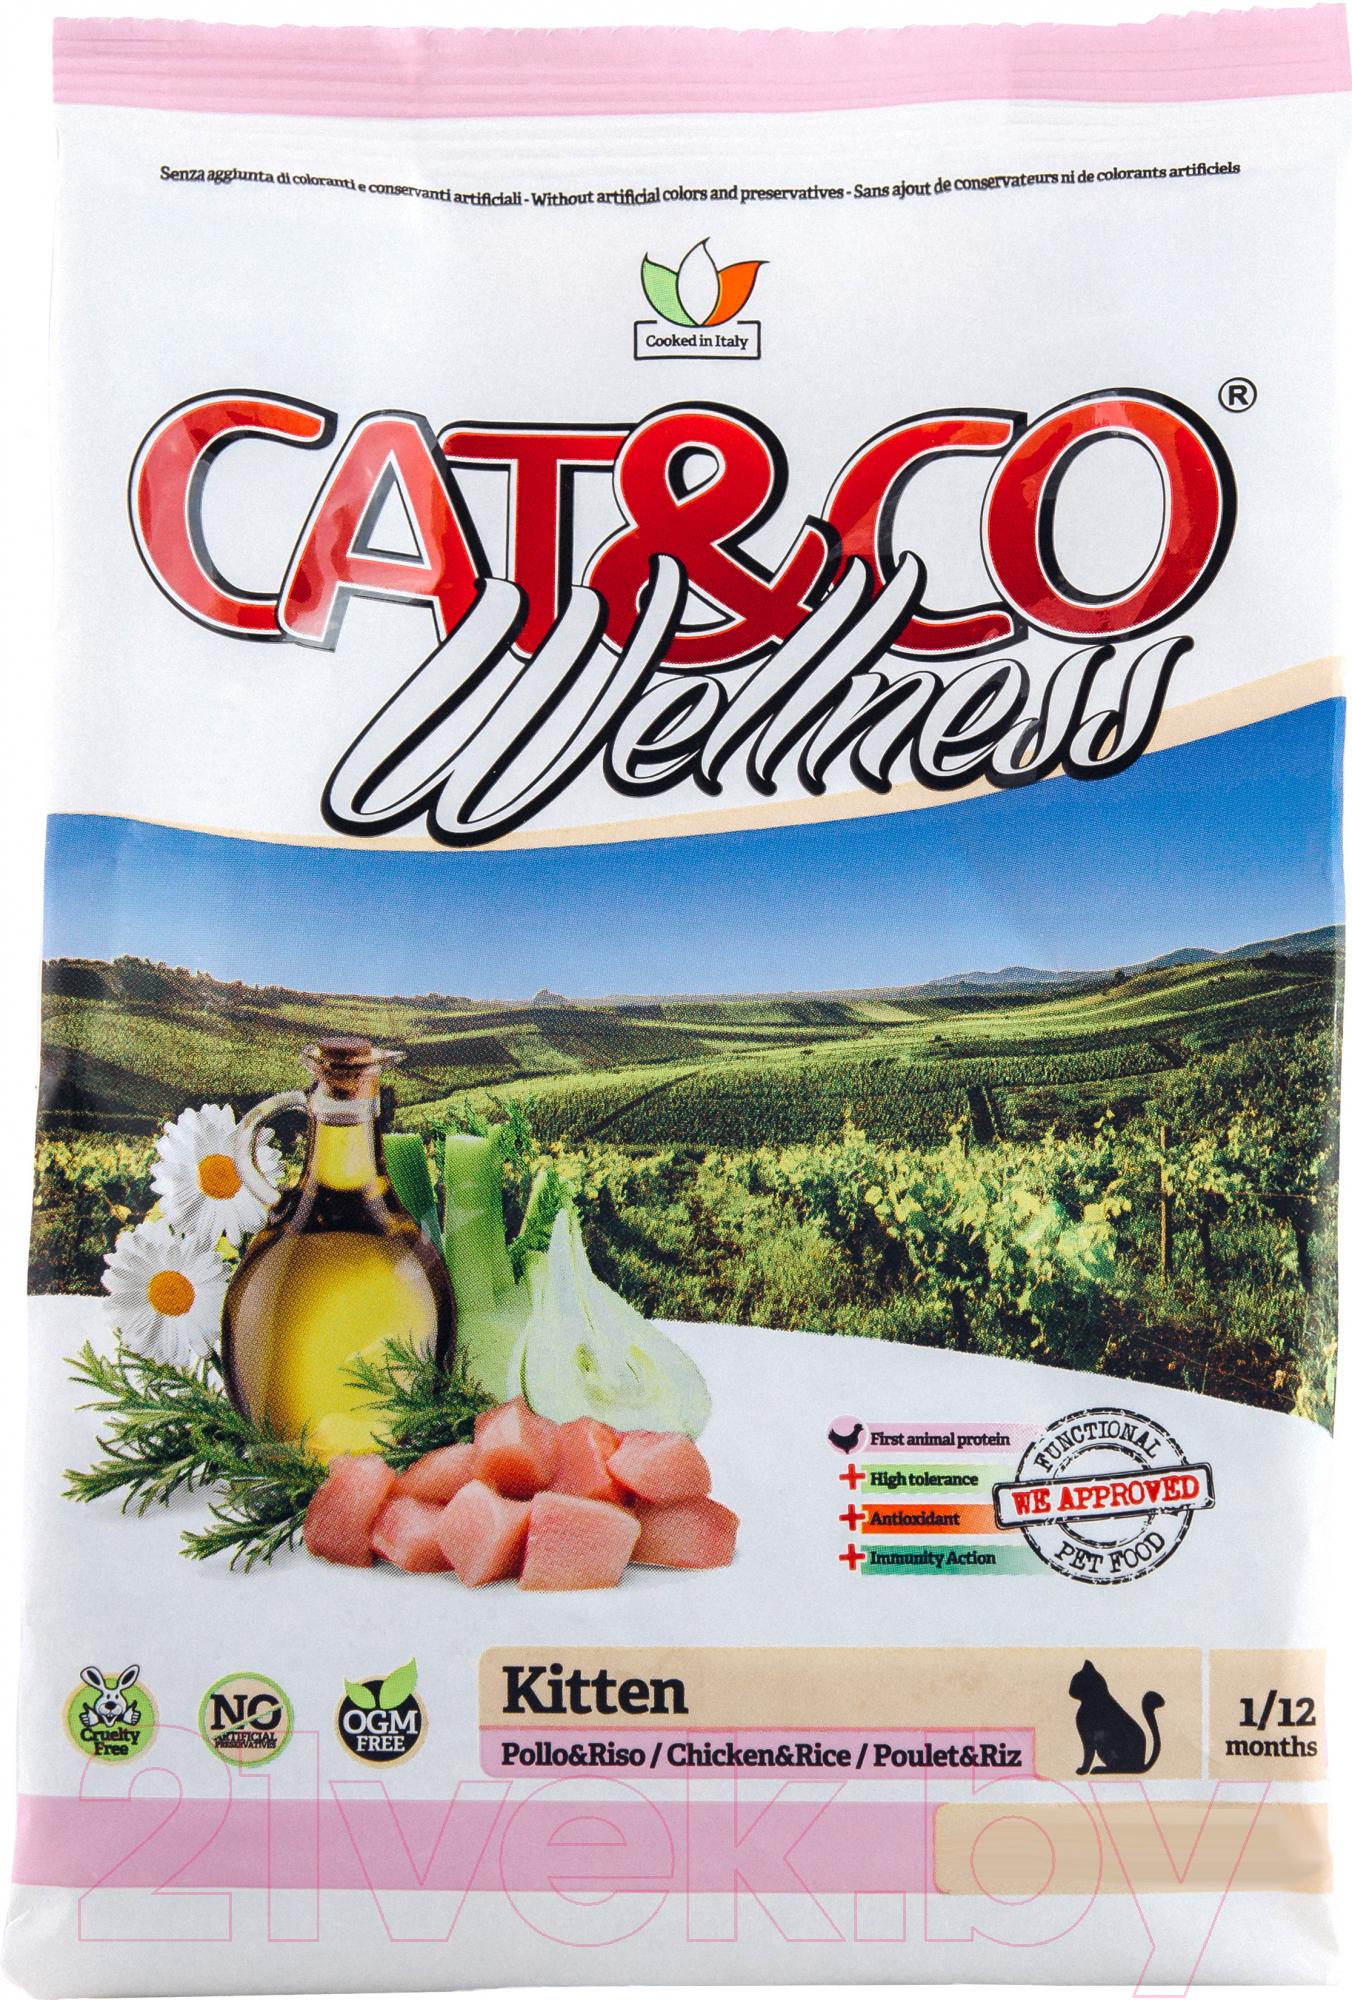 Купить Корм для кошек Adragna, Cat&Co Wellness Kitten Chicken&Rice (1.5кг), Италия